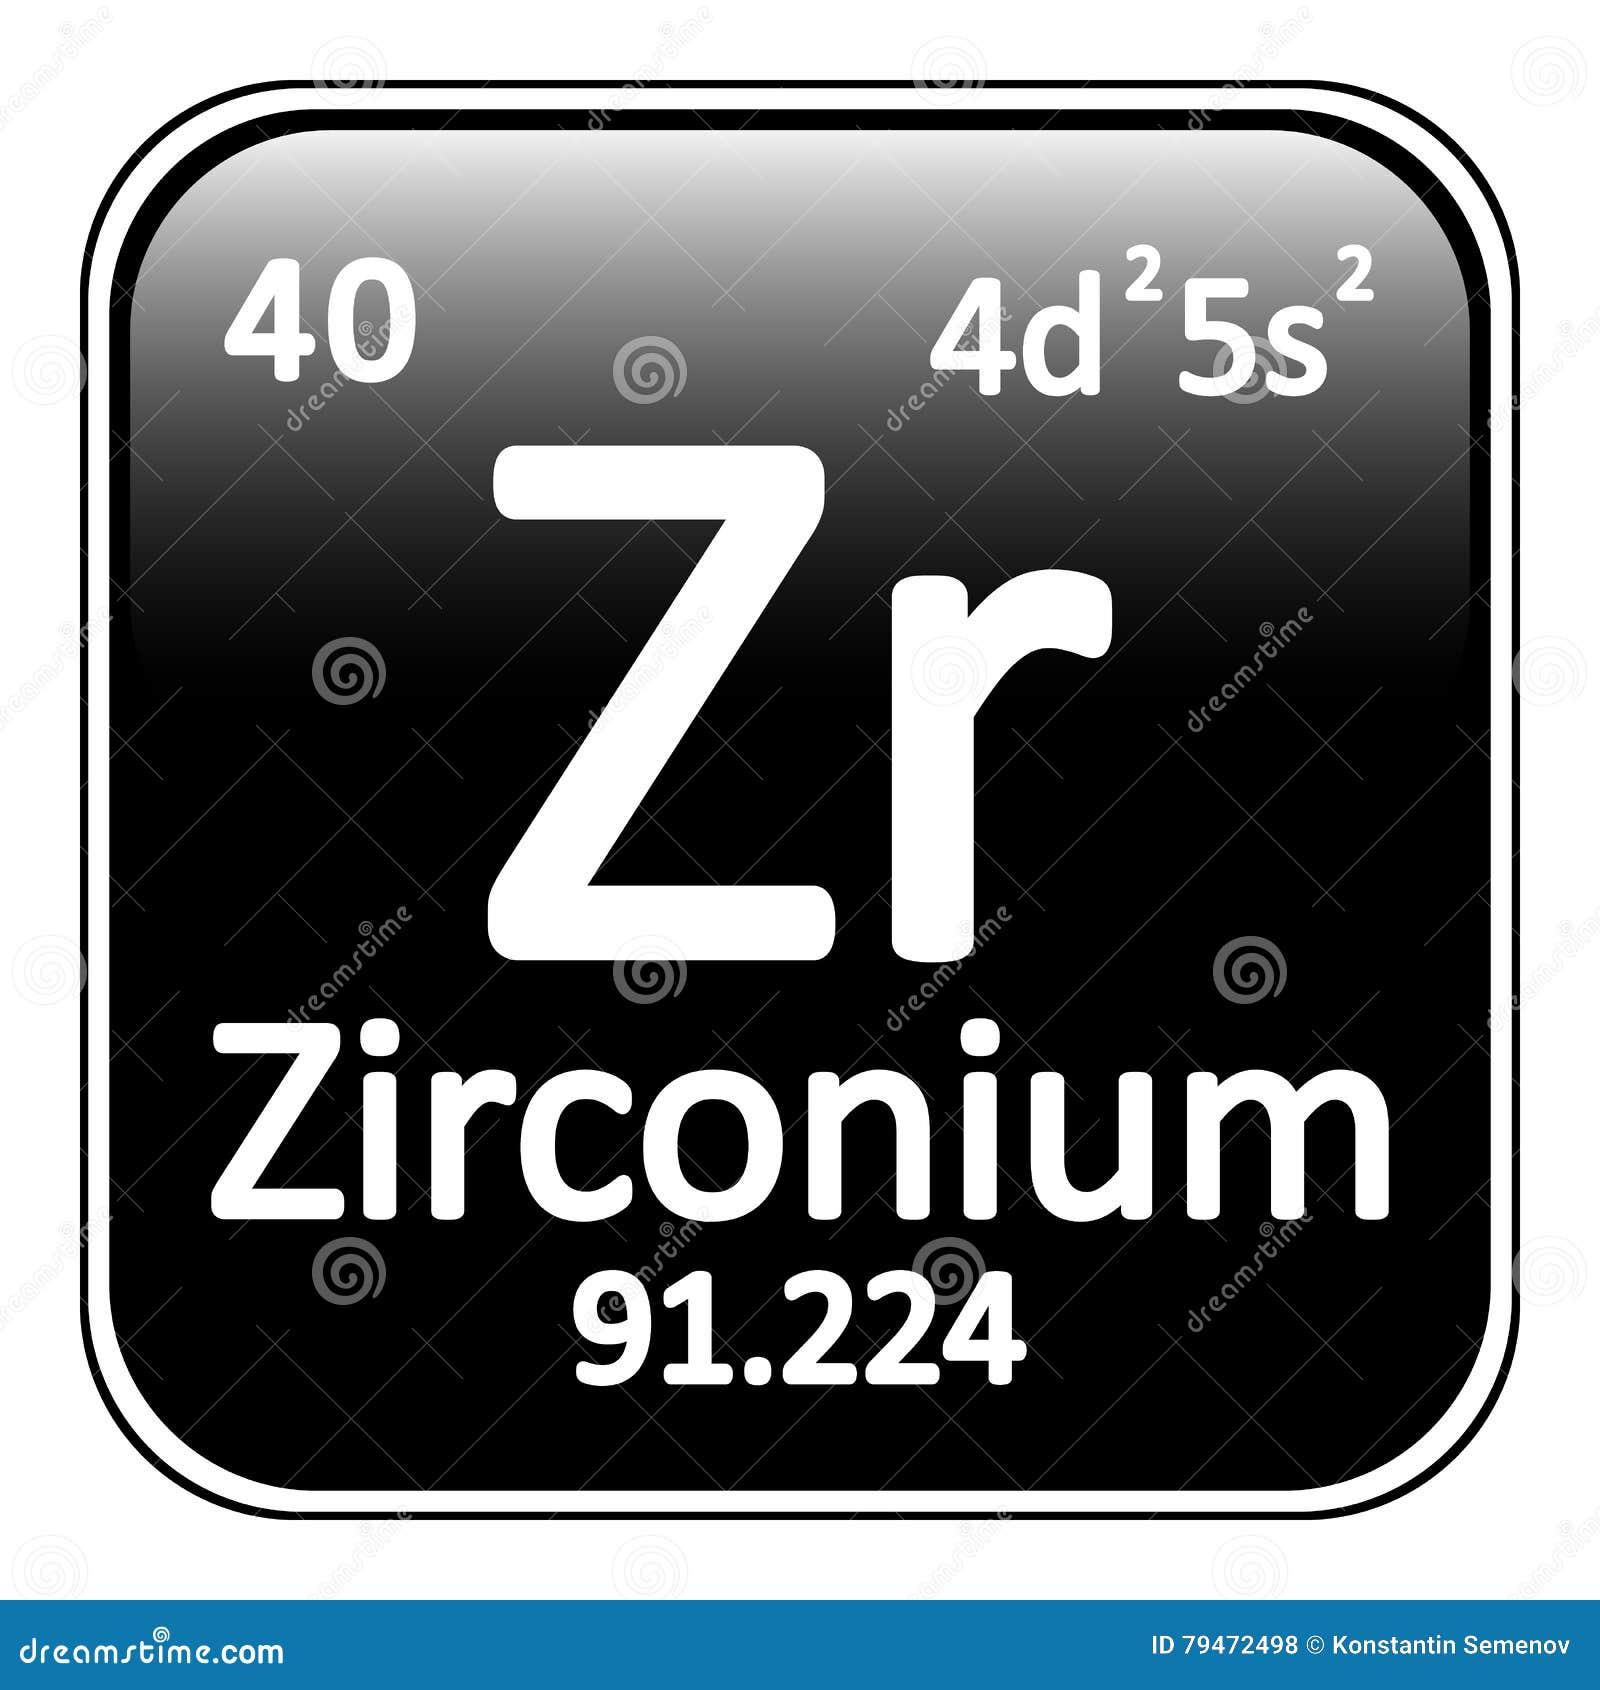 Zirconium symbol periodic table gallery periodic table images periodic table element zirconium icon stock illustration image background element icon periodic table white zirconium gamestrikefo gamestrikefo Images